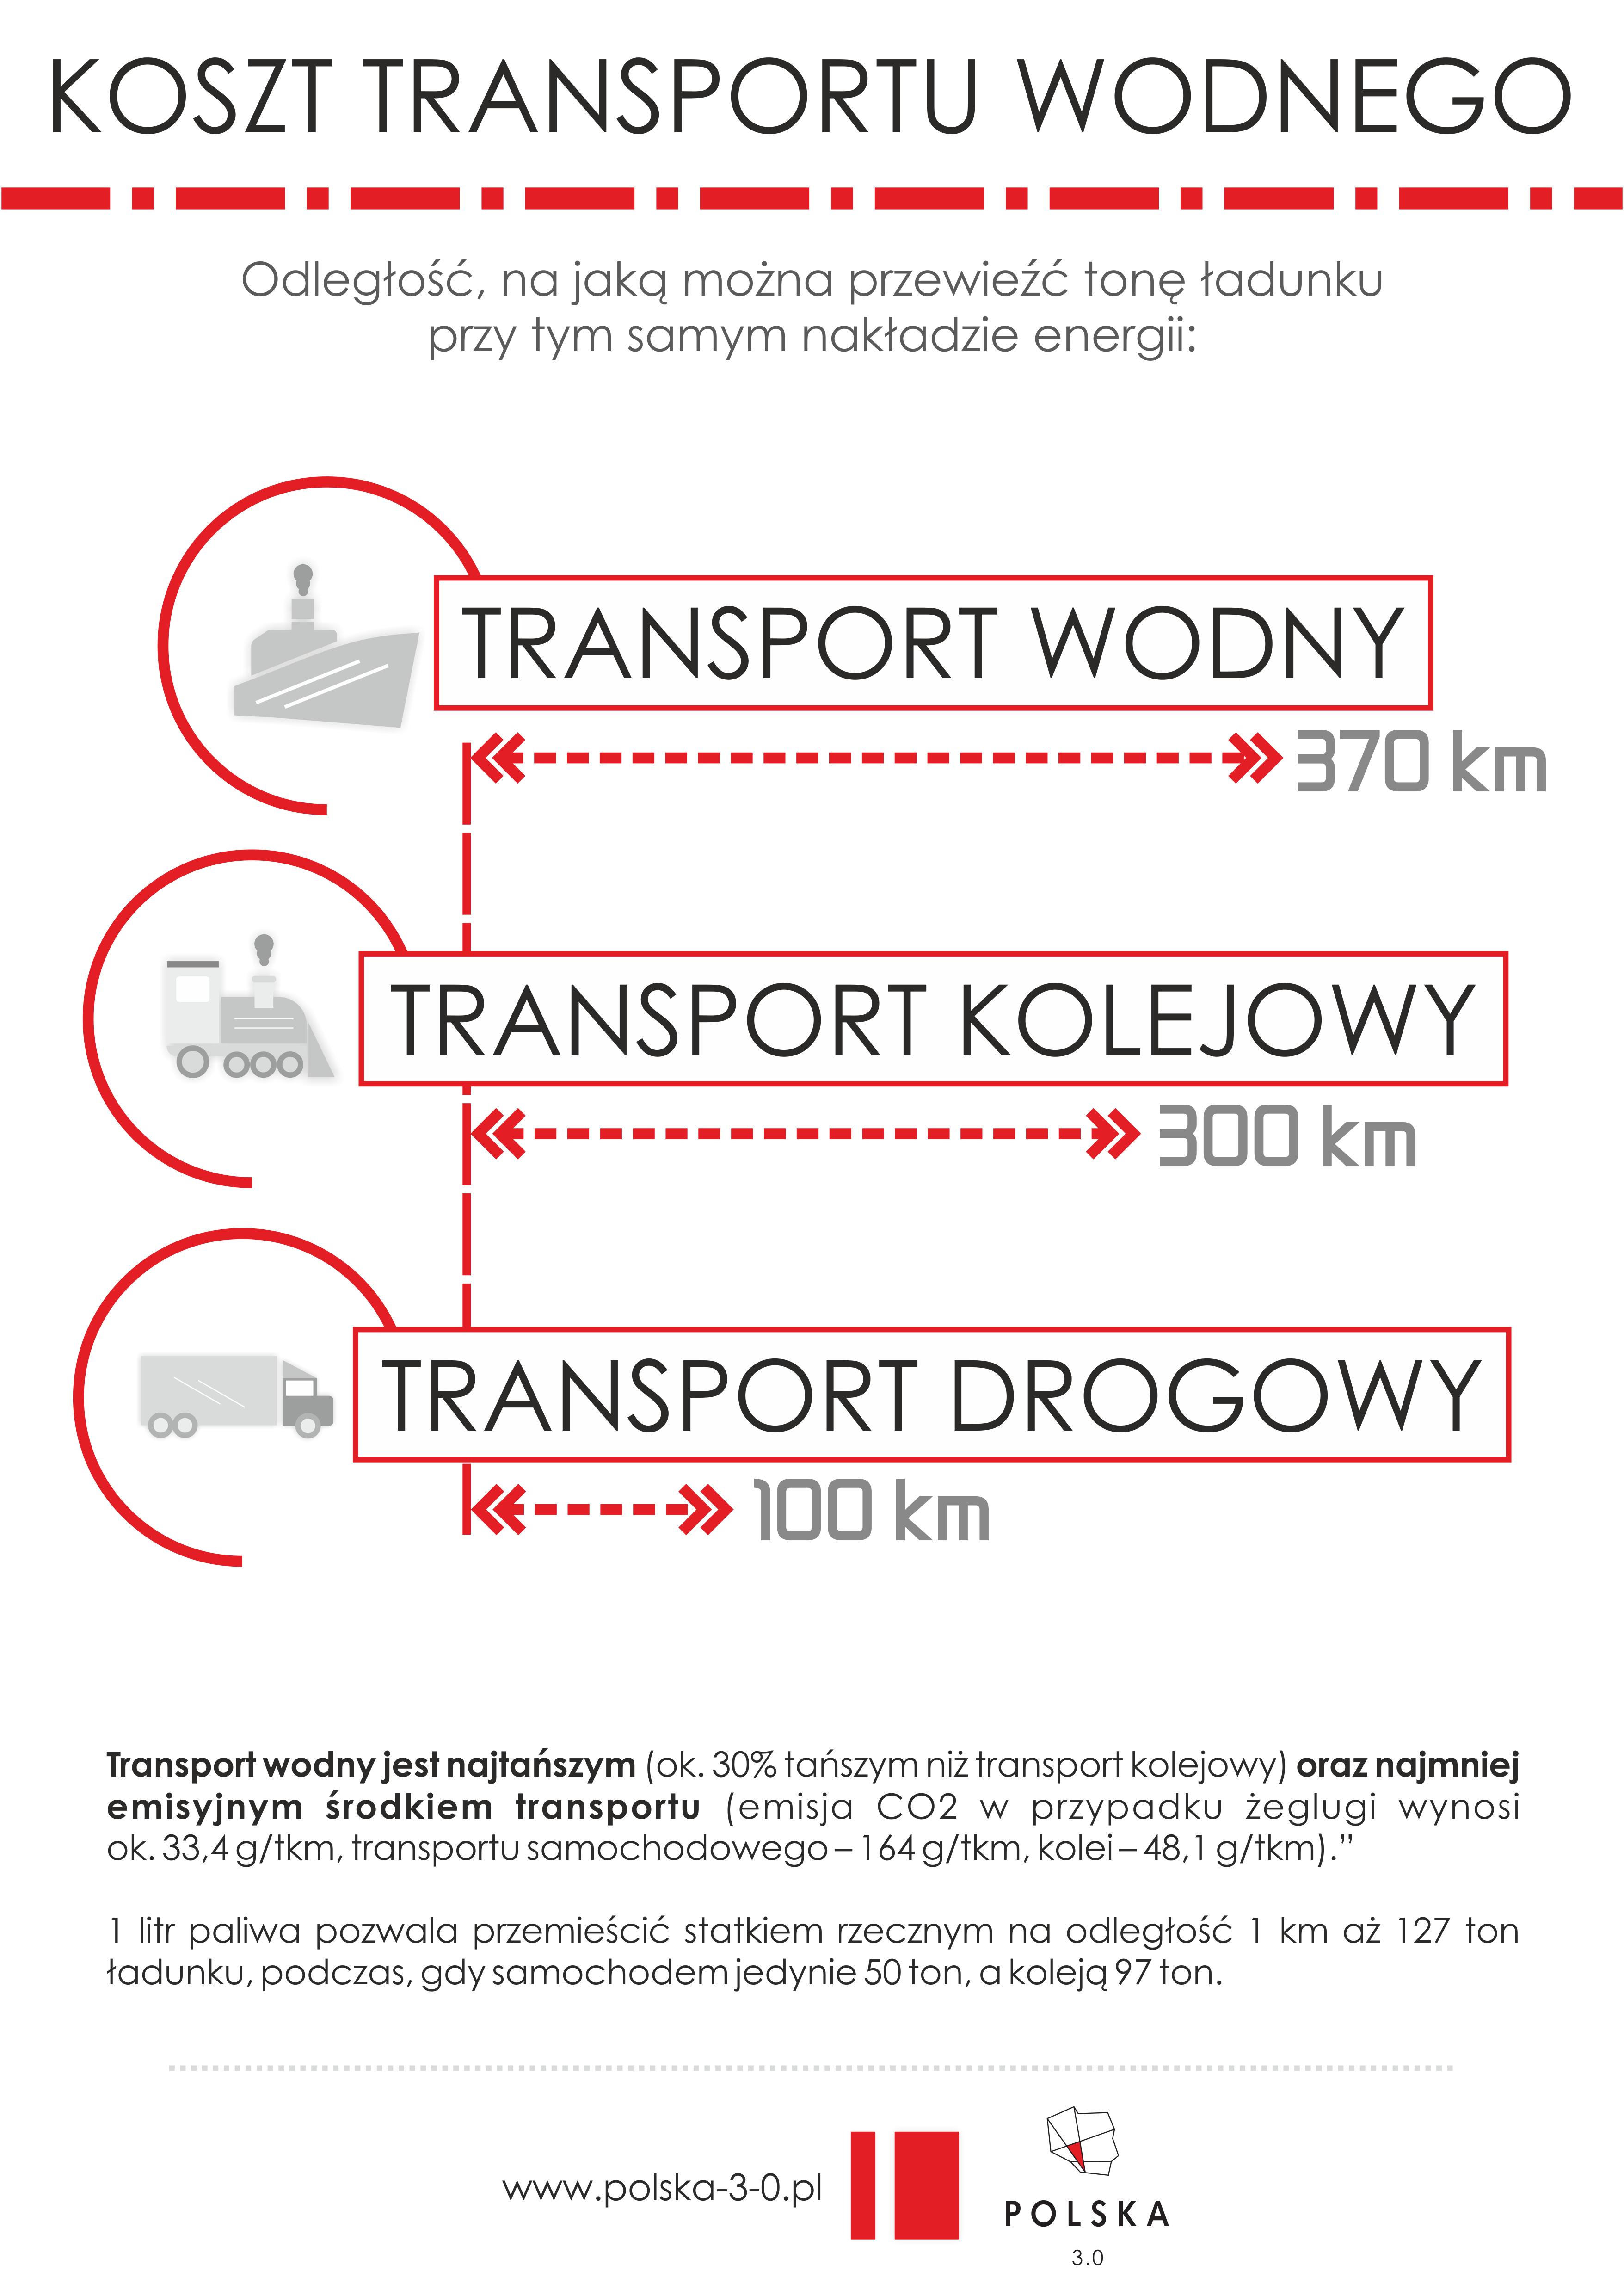 Koszt transportu - Grafika Edukacyjna PNG-INTERNET PL